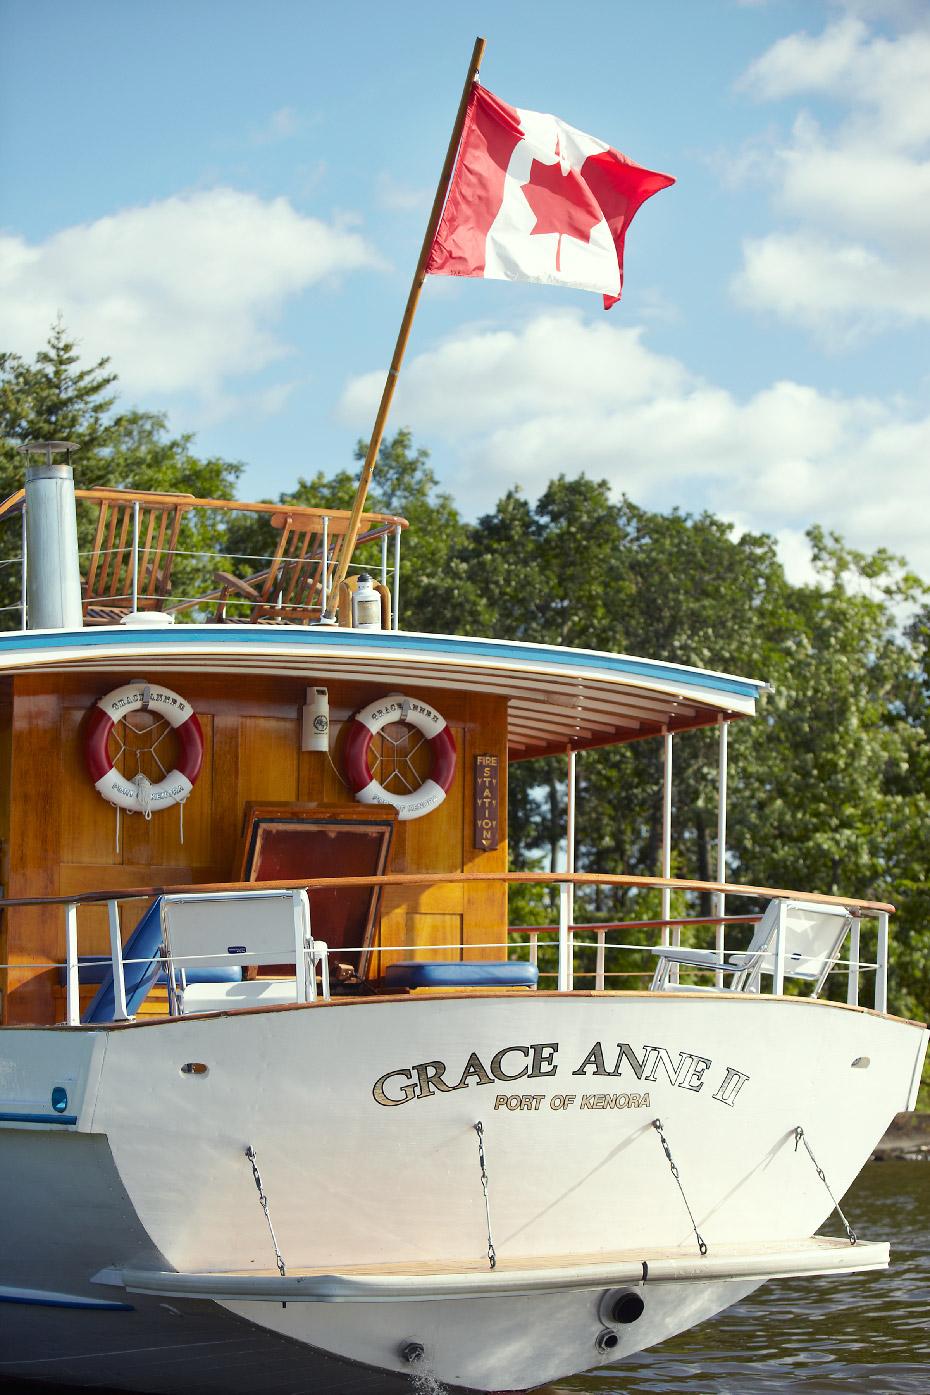 Stacey Van Berkel Photography I Grace Anne II Luxury 1930's Yacht I Lake of the Woods I Kenora, Ontario